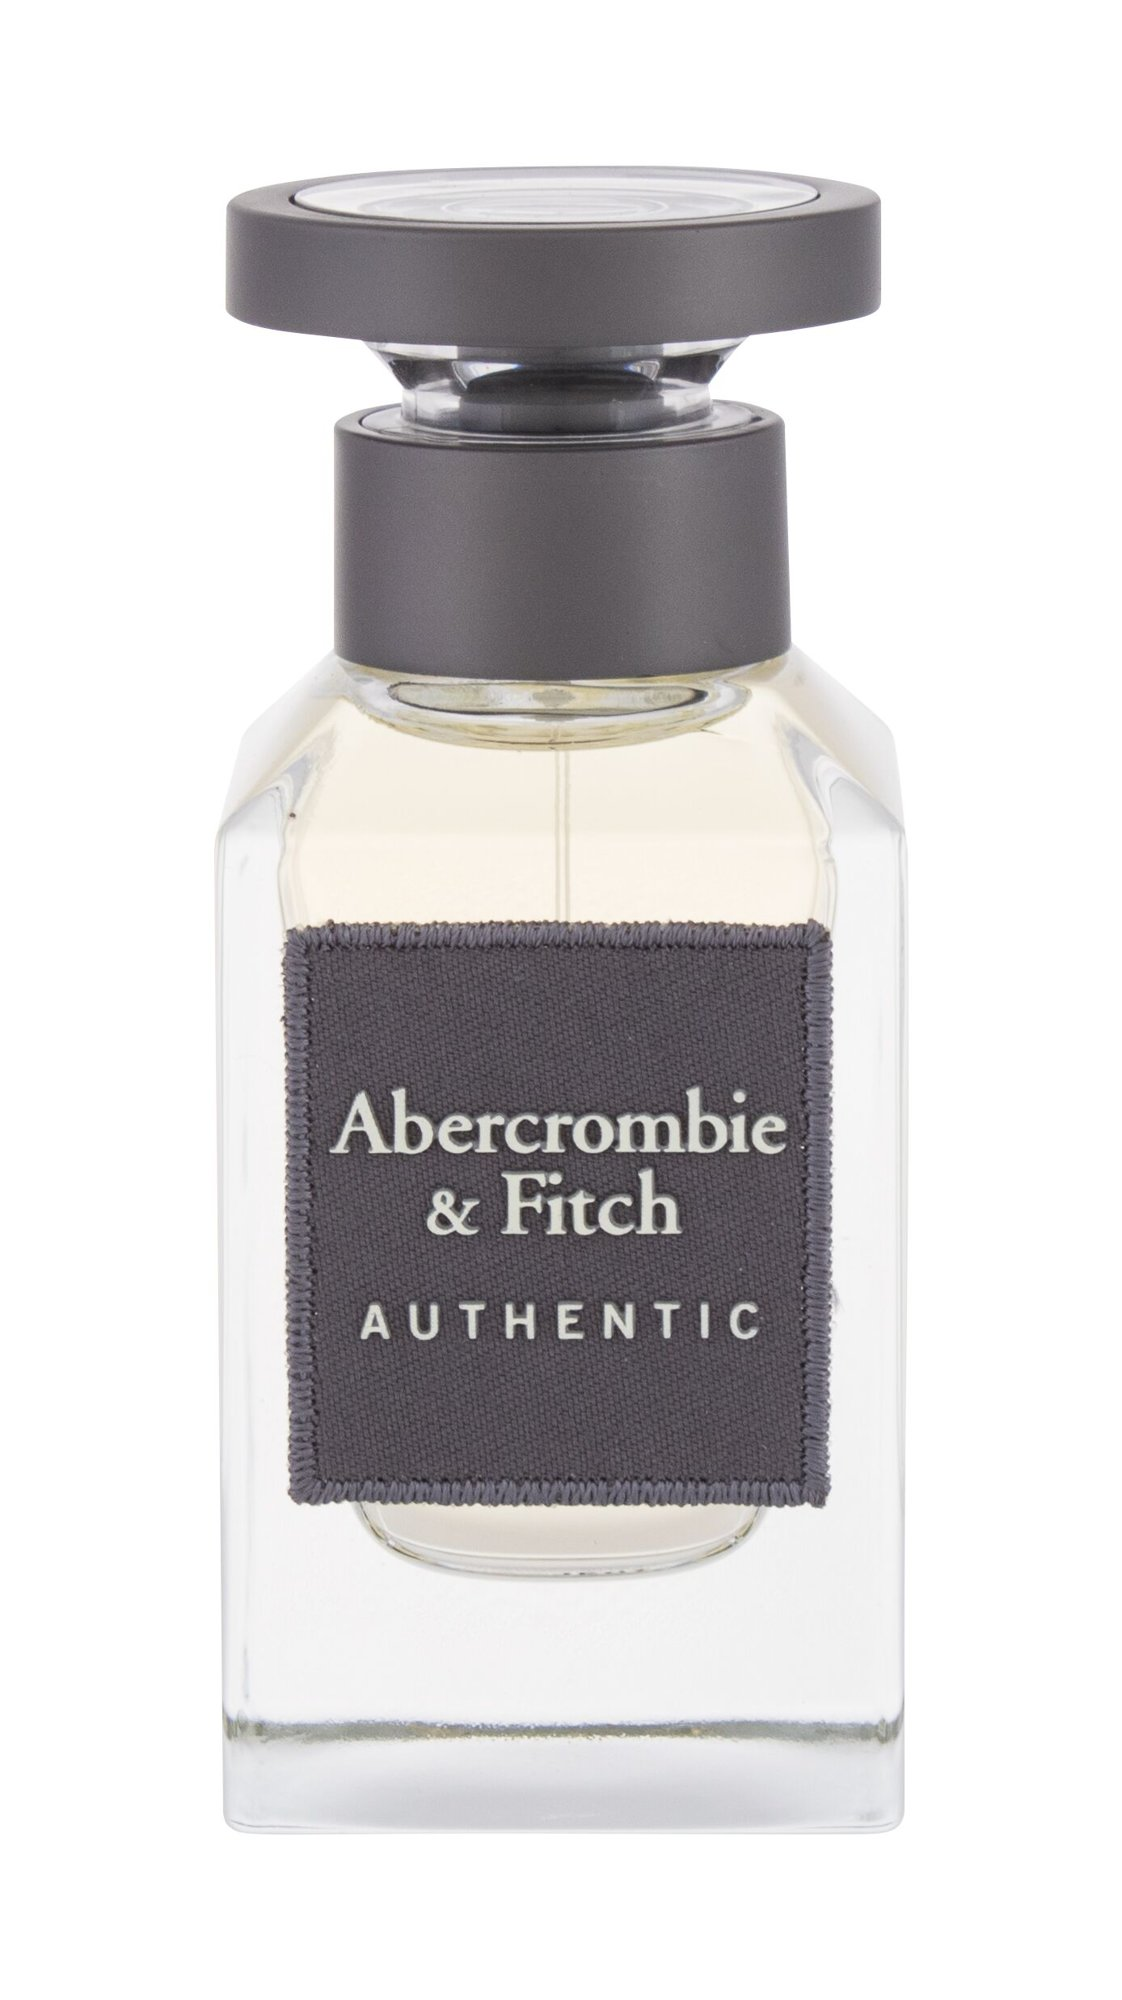 Abercrombie & Fitch Authentic, Toaletní voda 50ml